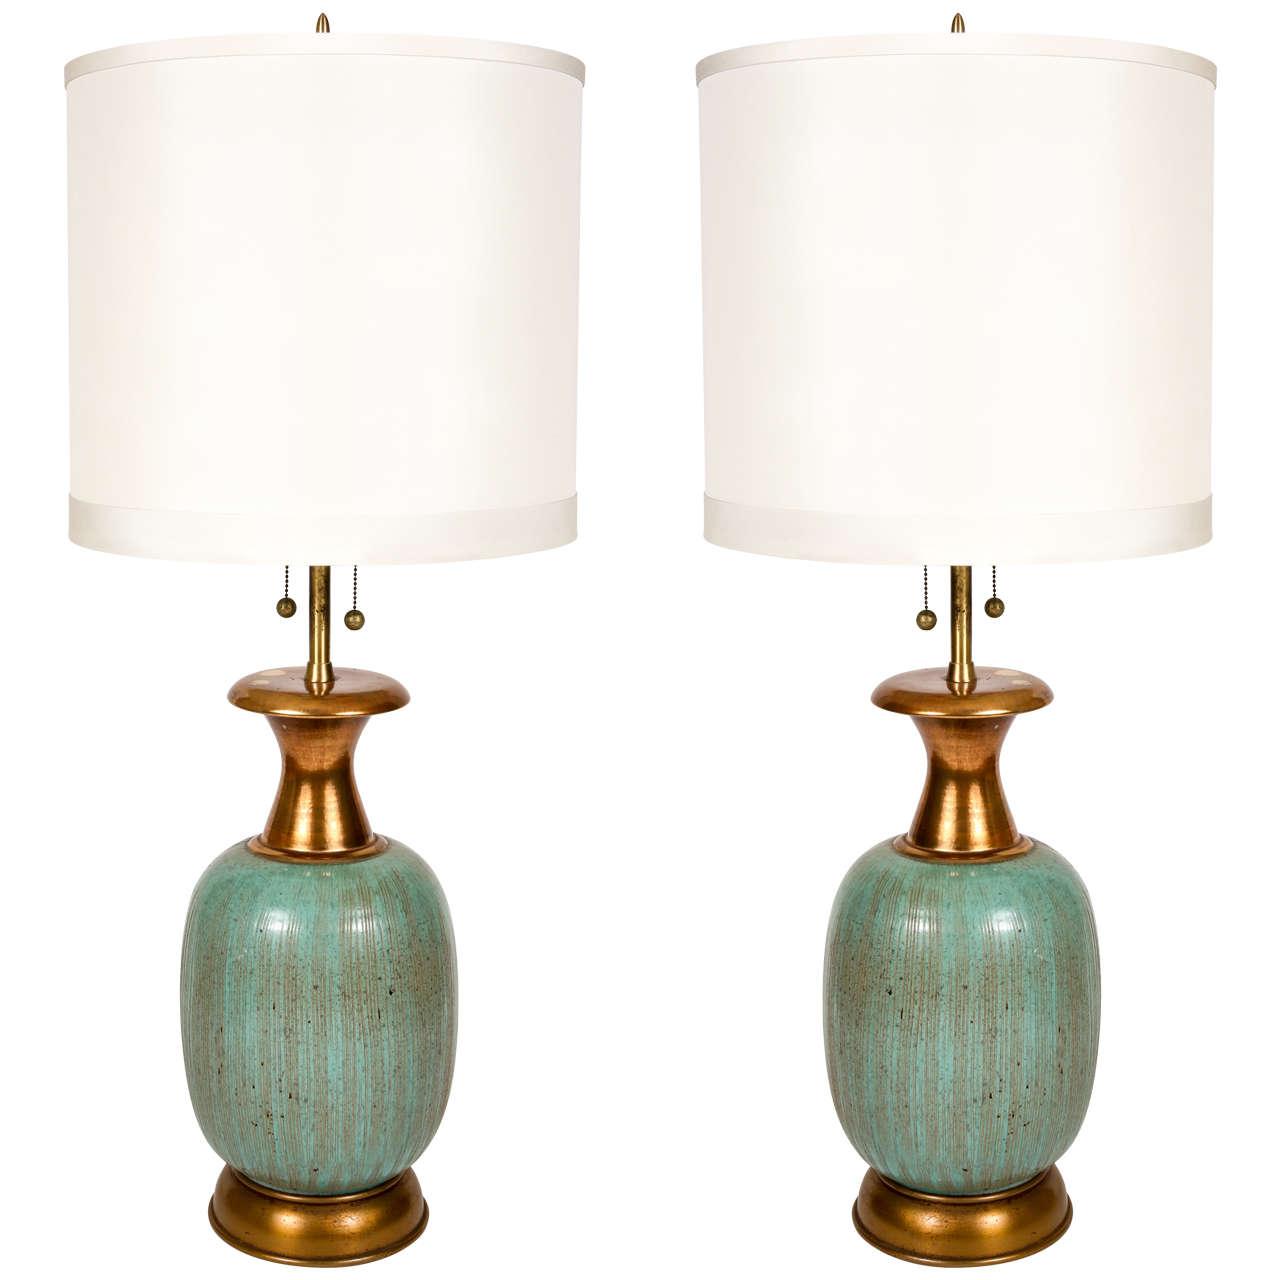 pair of aquamarine ceramic table lamps for sale at 1stdibs